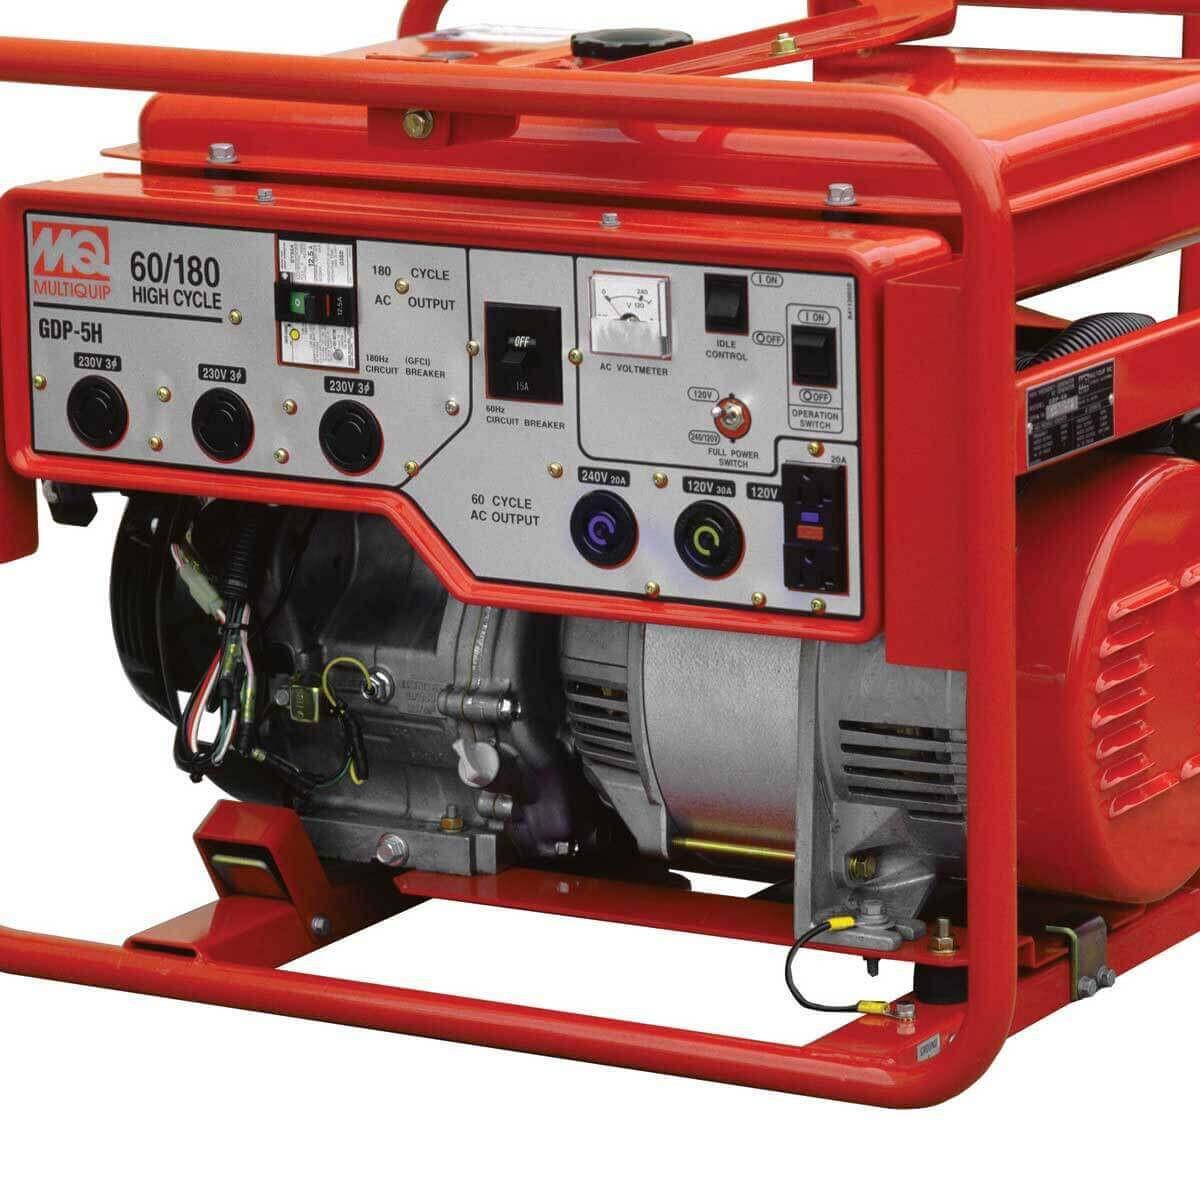 multiquip high-cycle generator